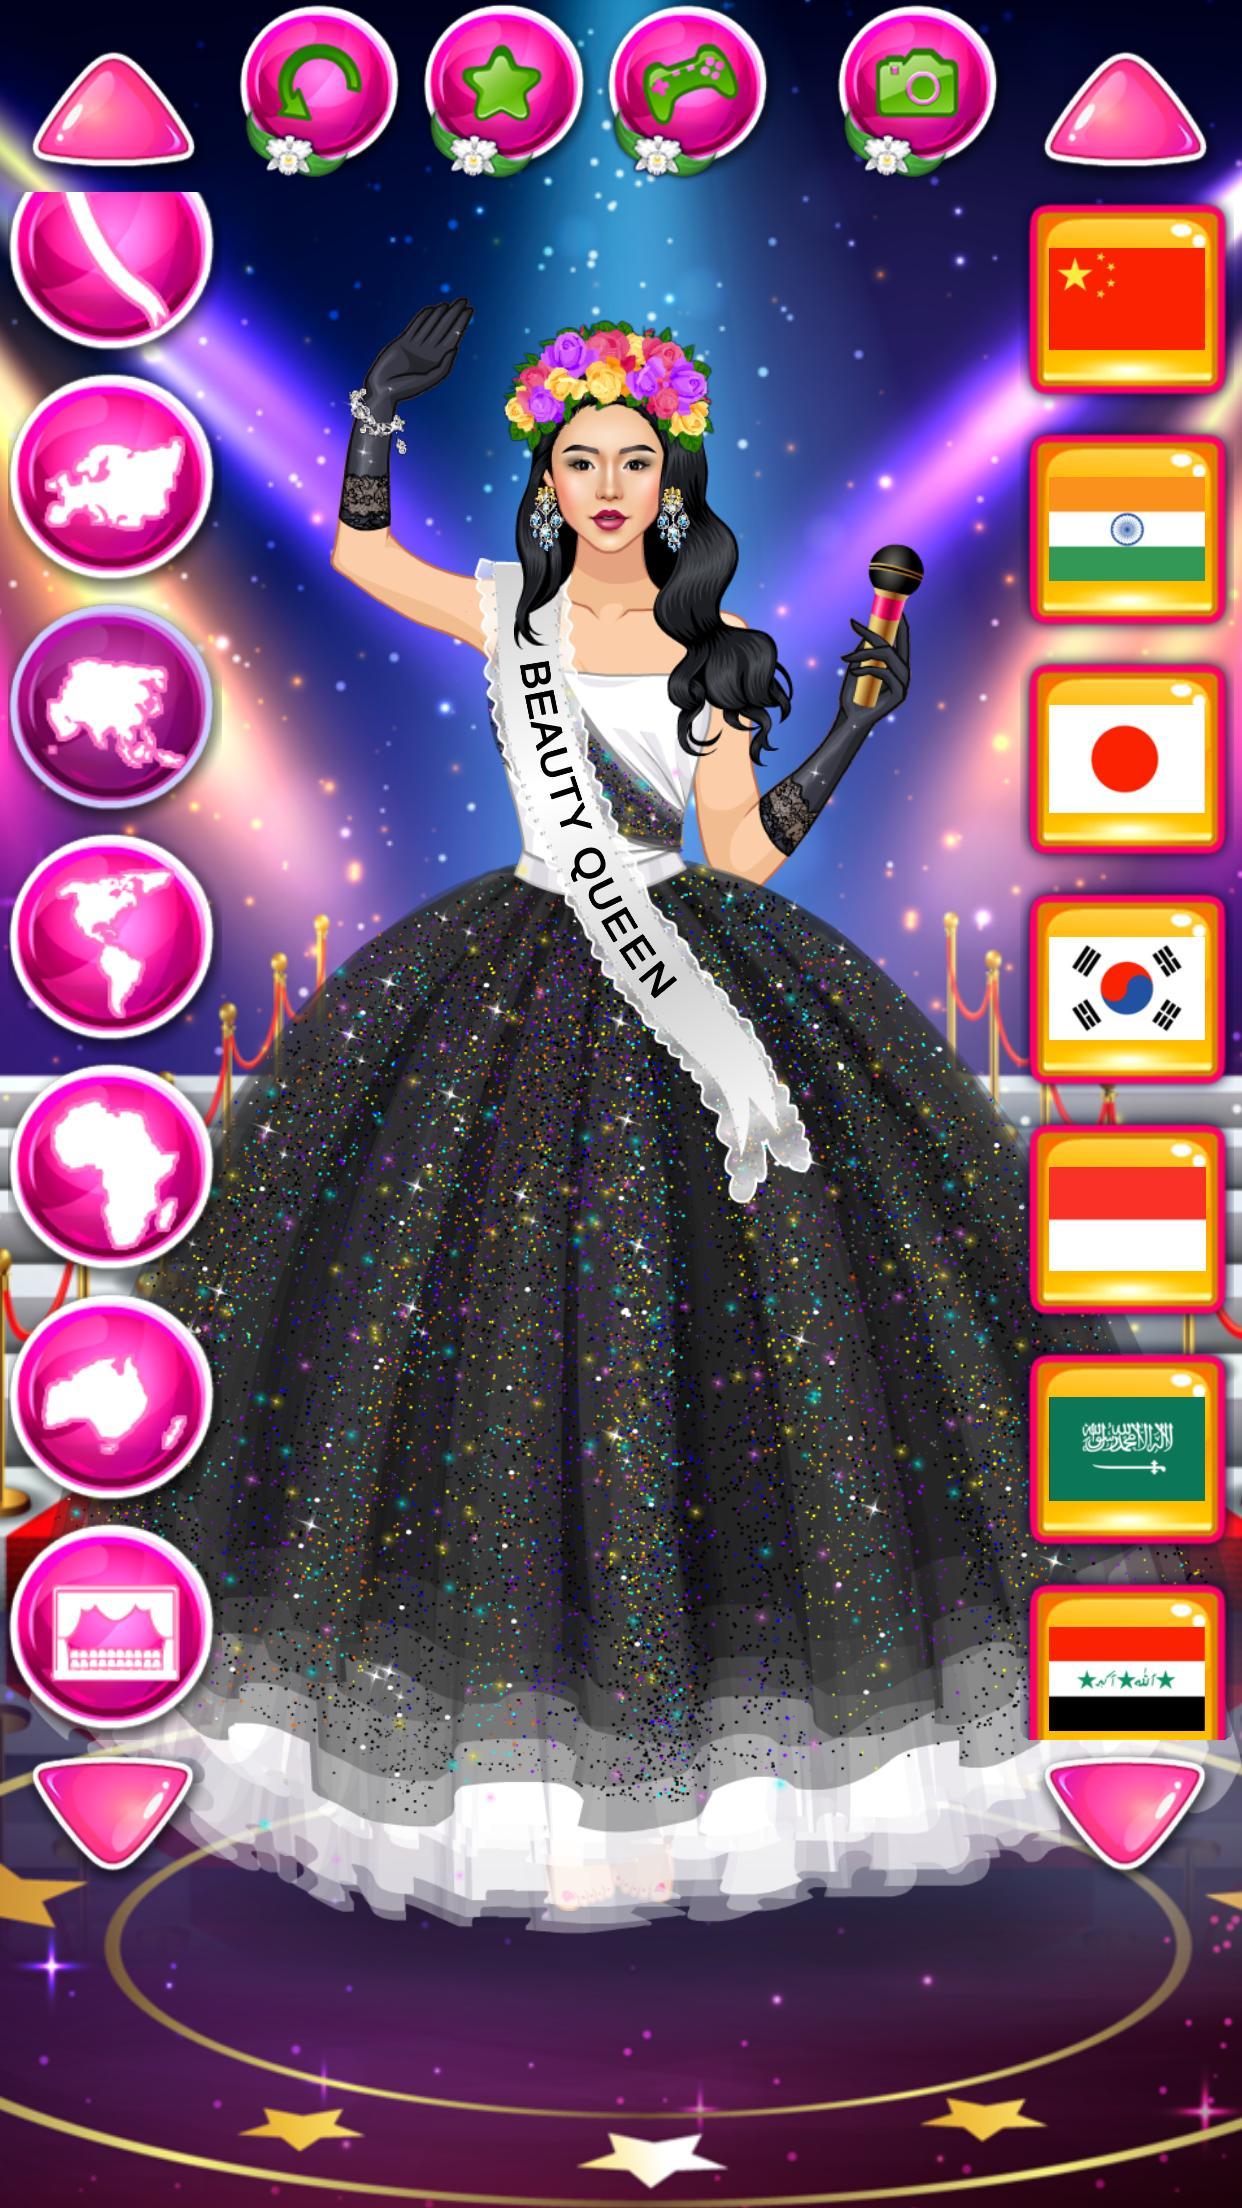 Beauty Queen Dress Up - Star Girl Fashion 1.1 Screenshot 5